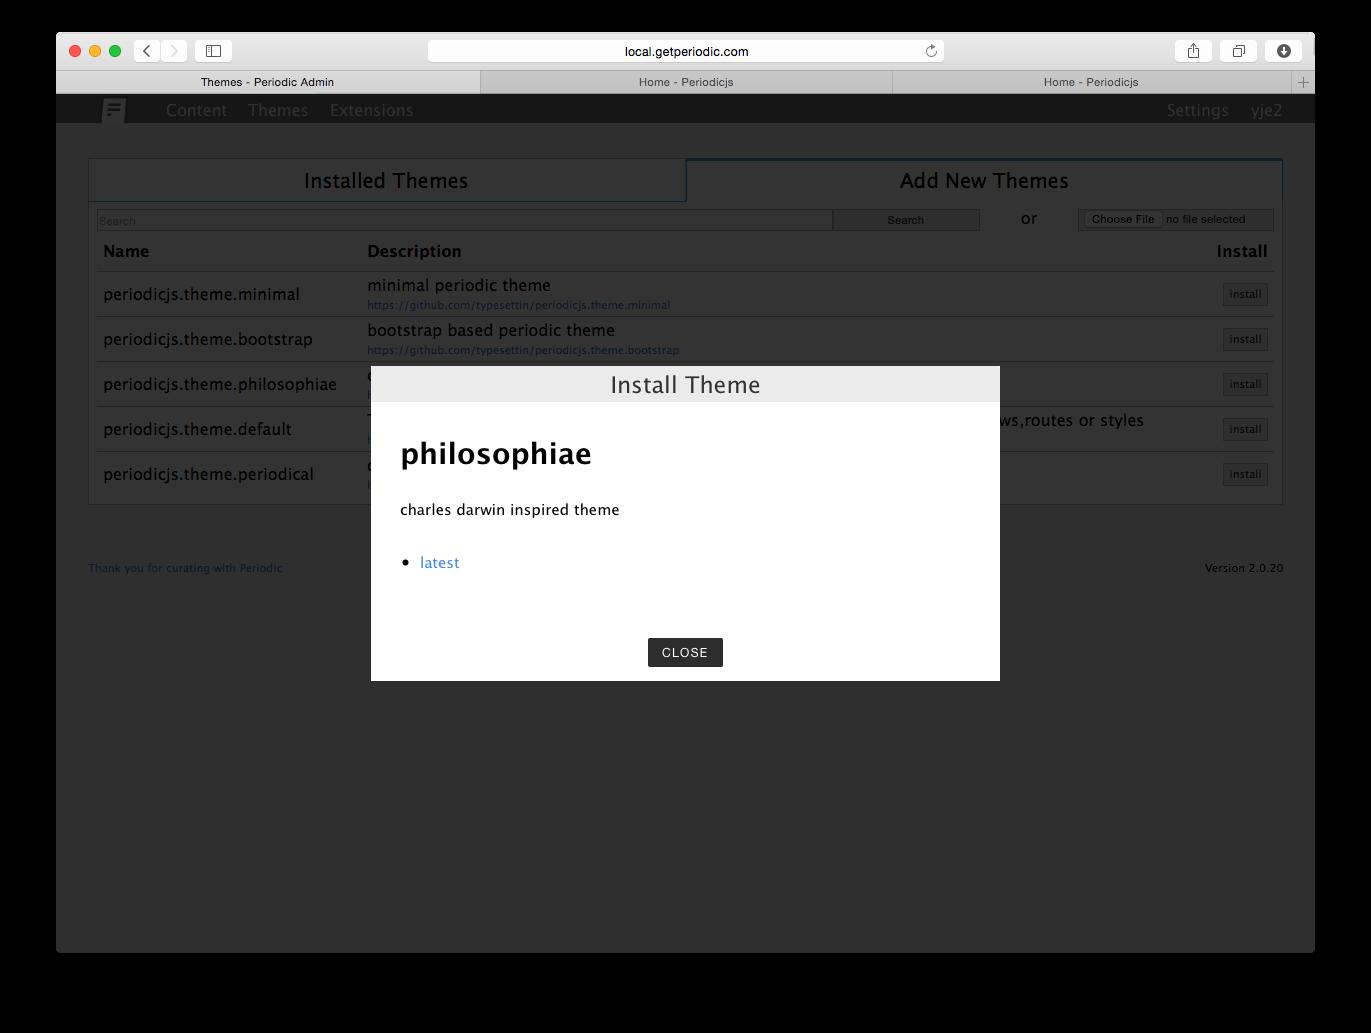 new theme install modal